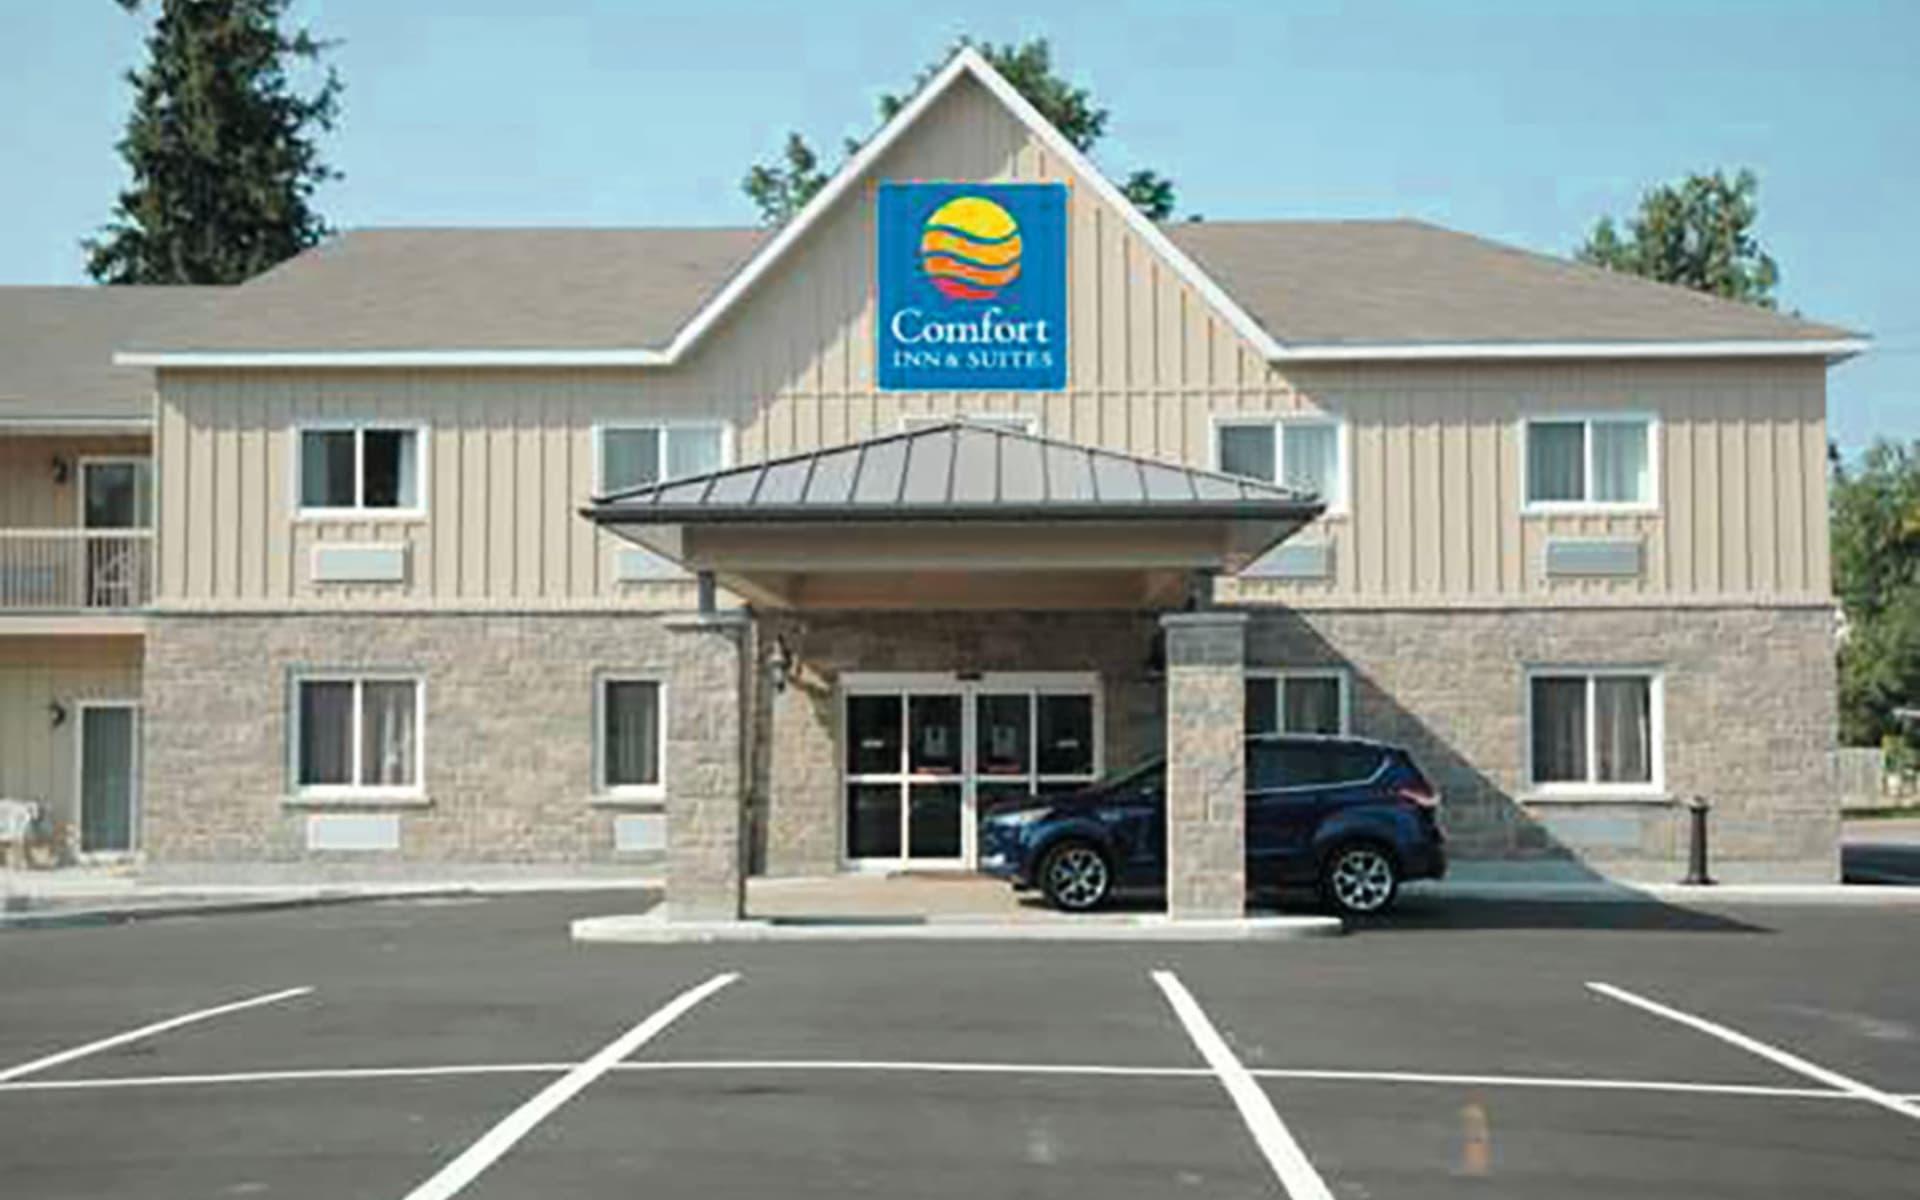 Comfort Inn & Suites 1000 Islands Harbour District in Gananoque: Exterior_Comfort Inn 1000 Islands_Aussenansicht_Jonview